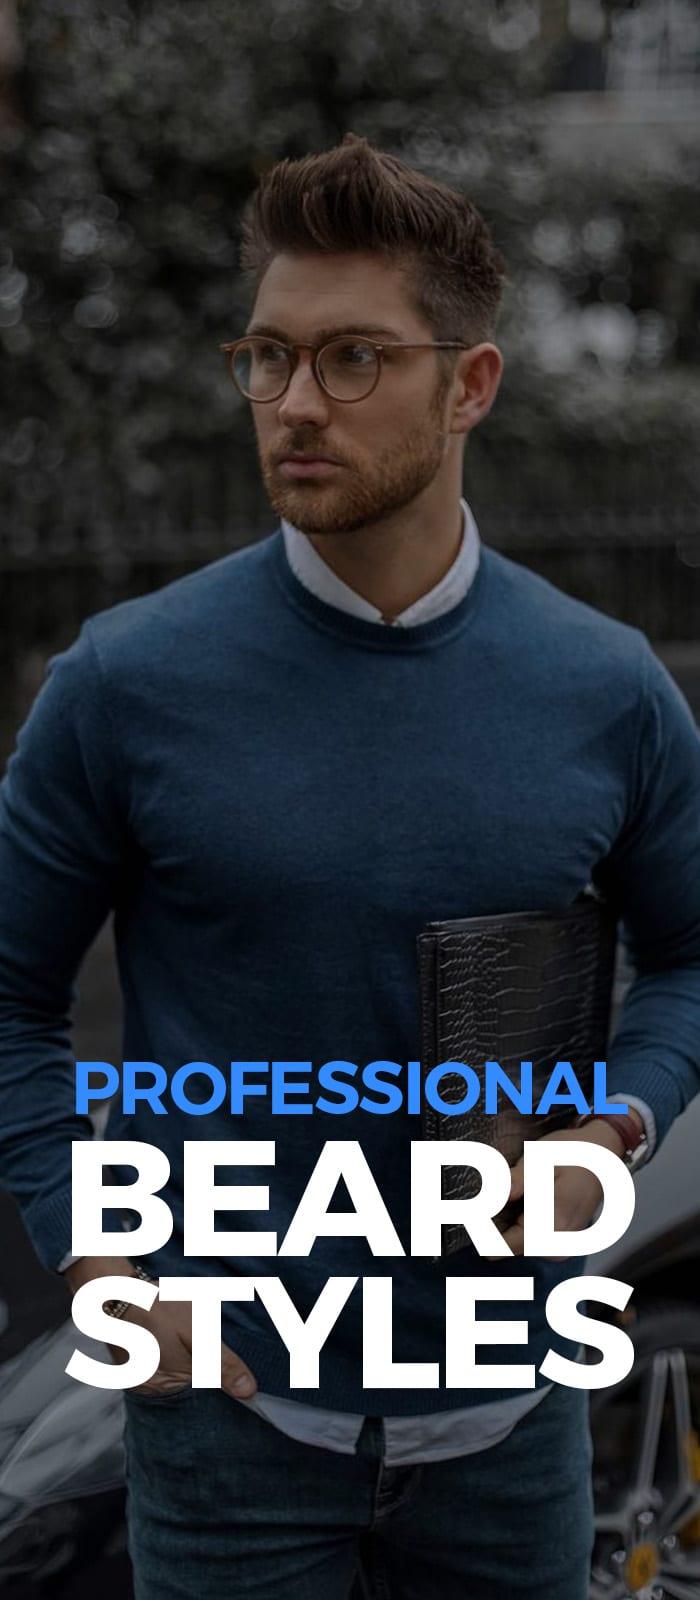 Professional Beard Styles!